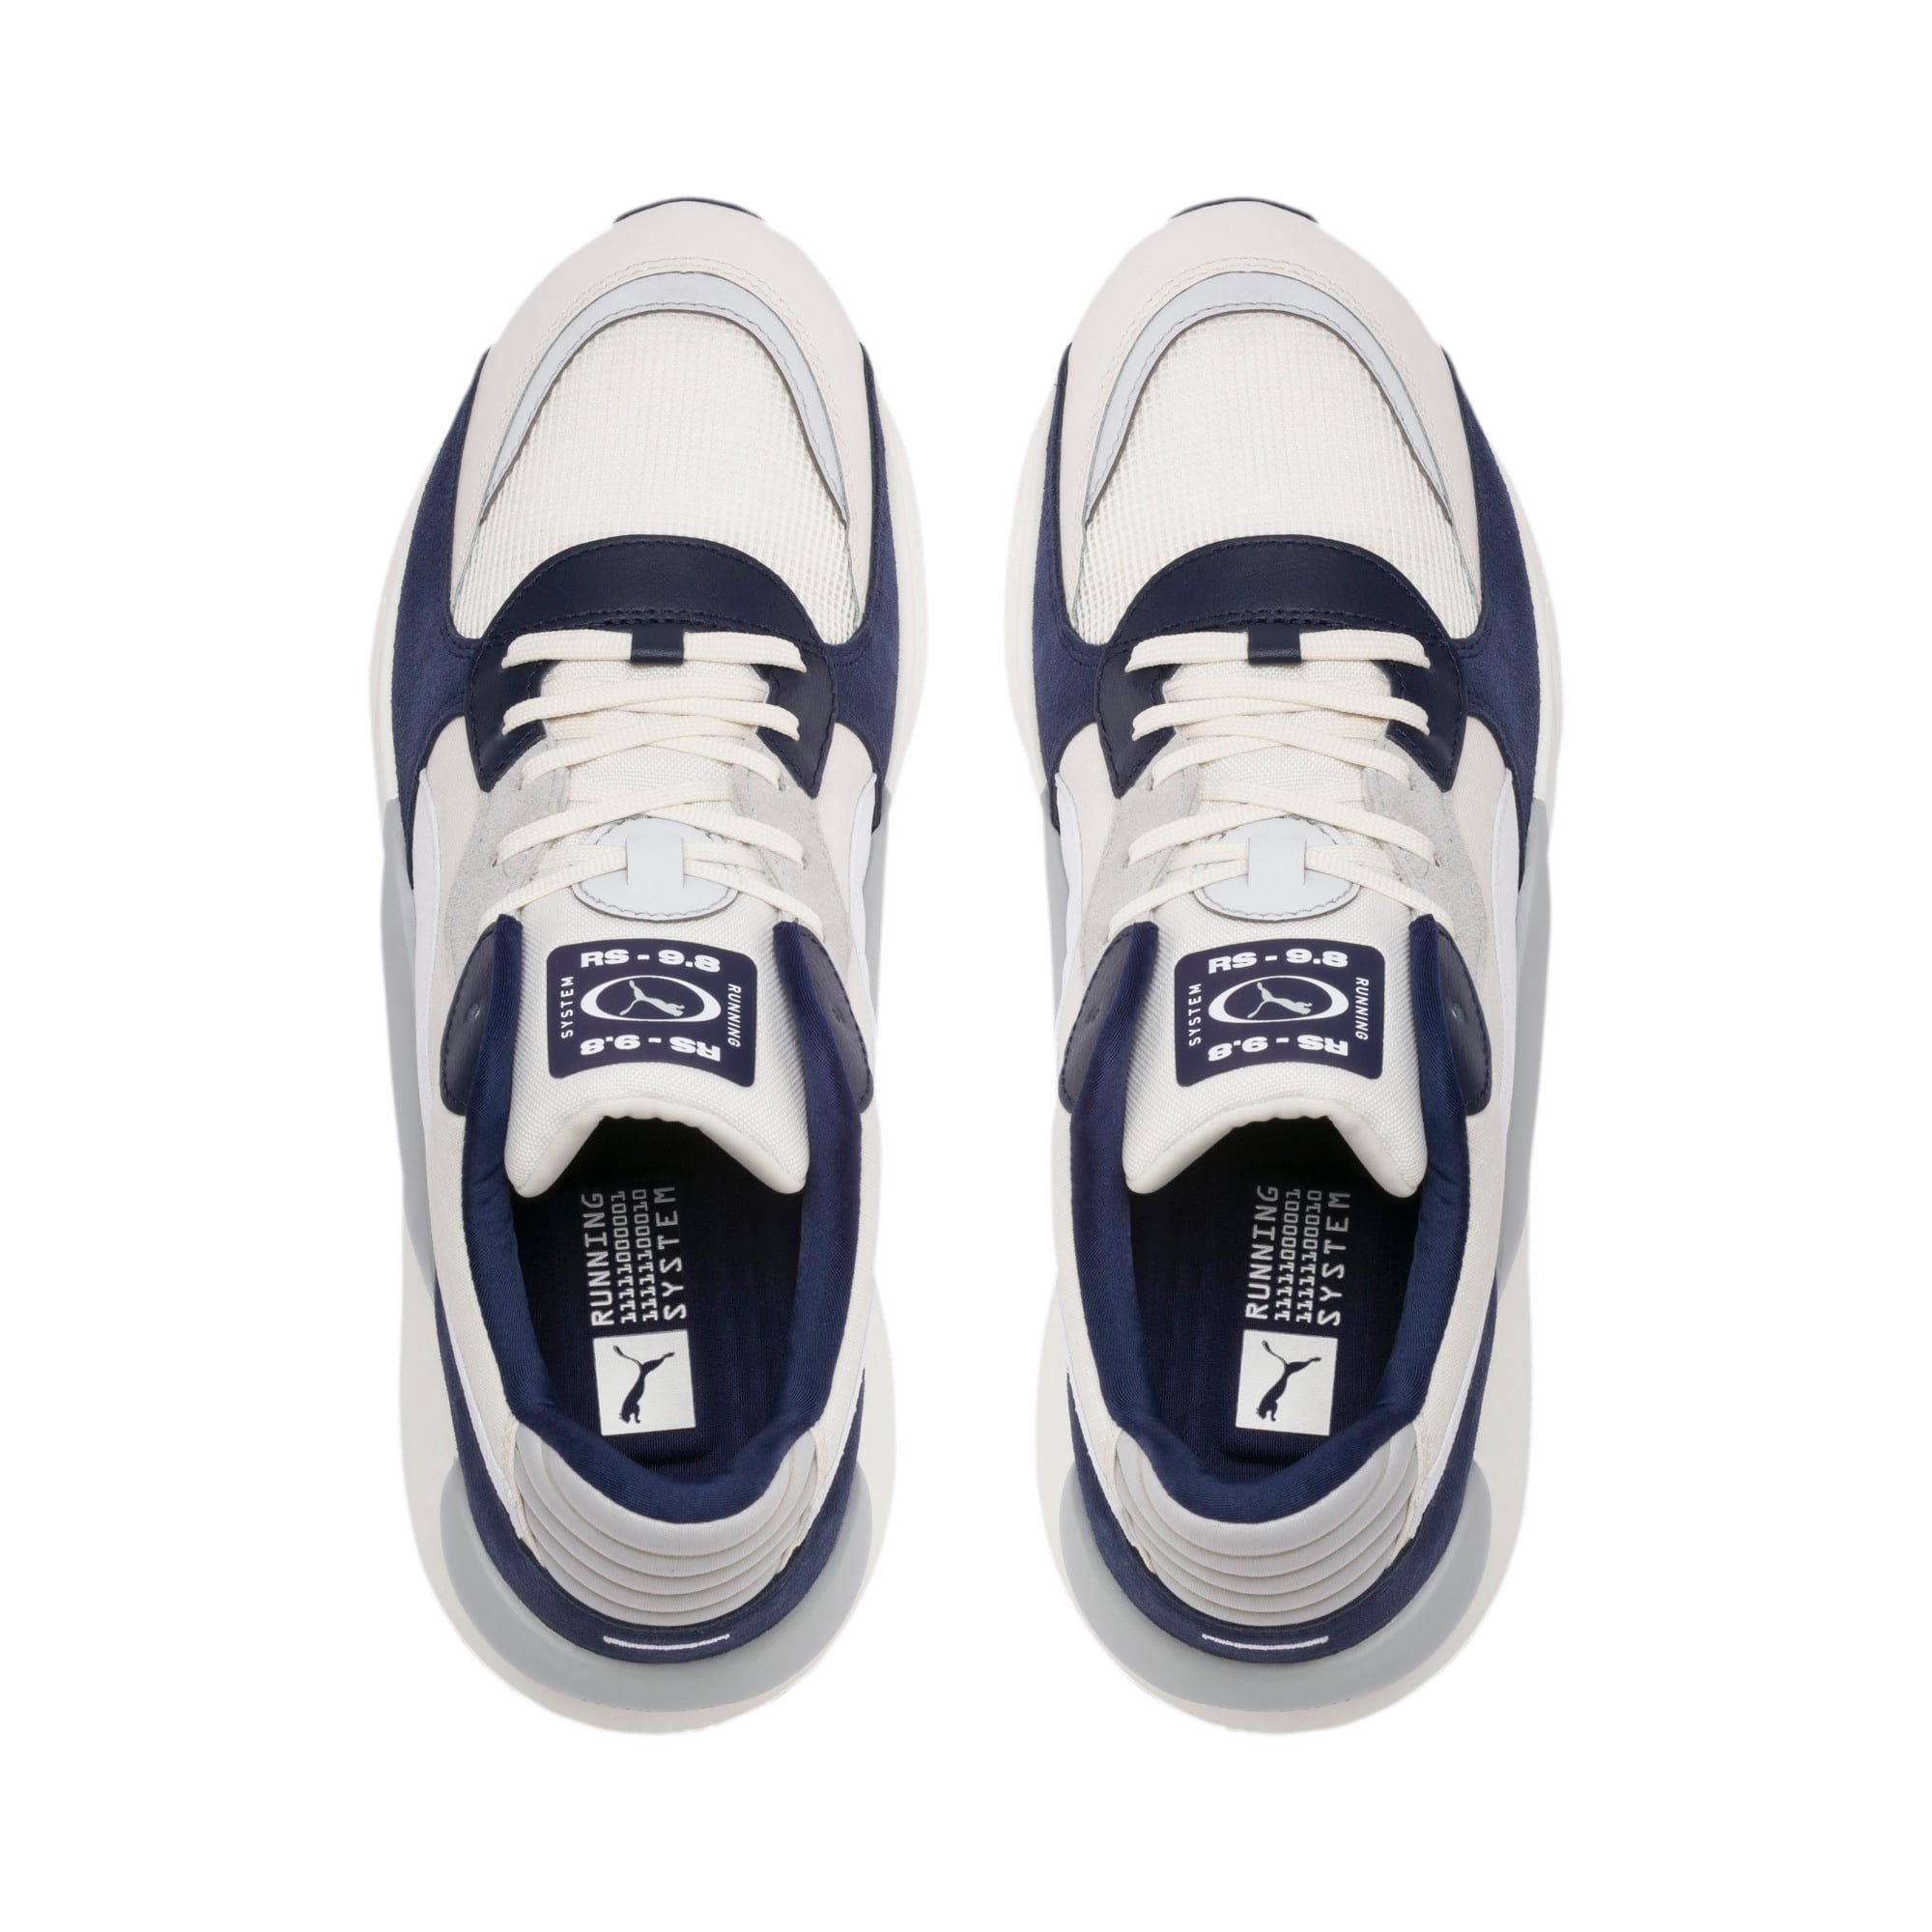 Thumbnail 6 of RS 9.8 Space Sneakers, Whisper White-Peacoat, medium